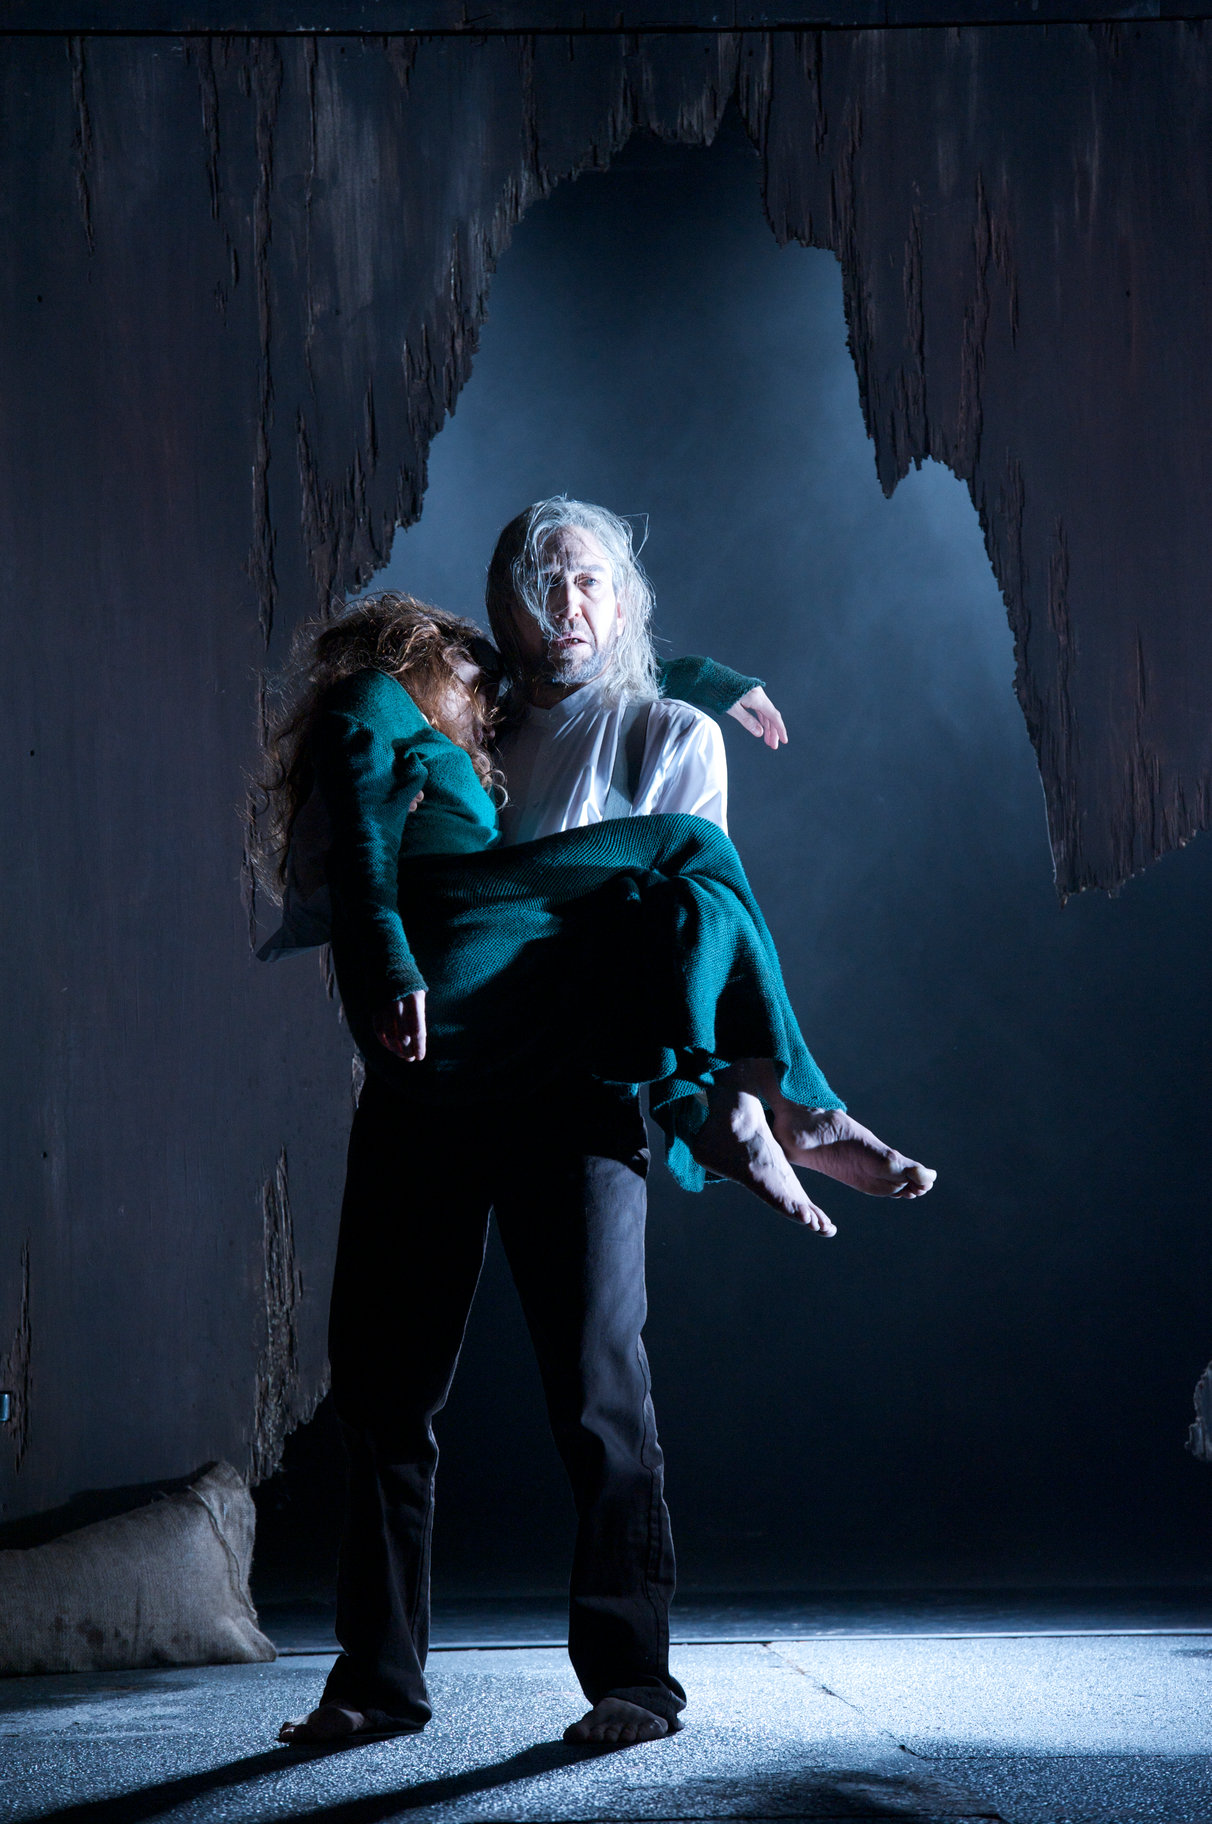 A man carries a woman's body through a cave.